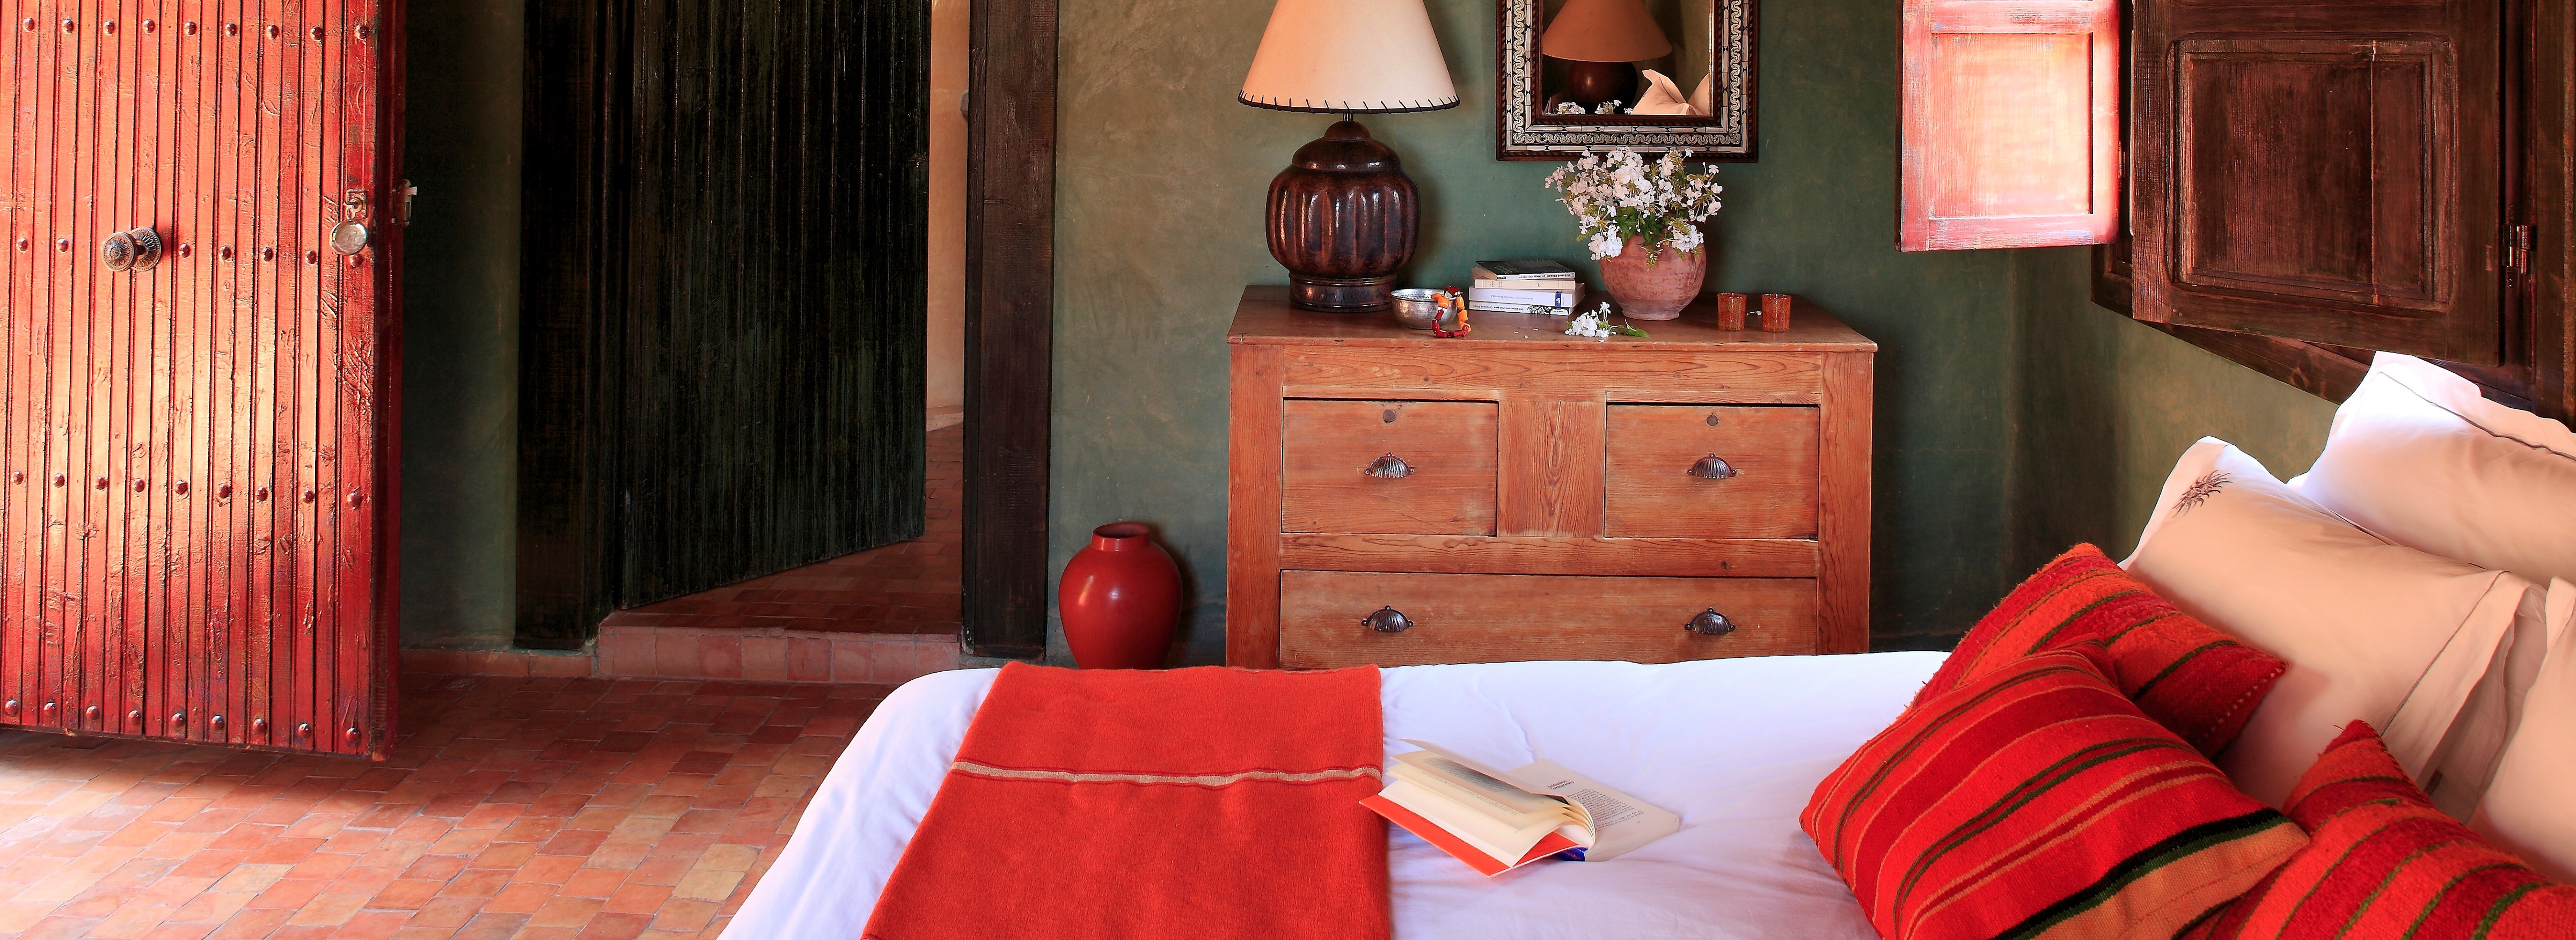 le-jardin-des-douars-bedroom